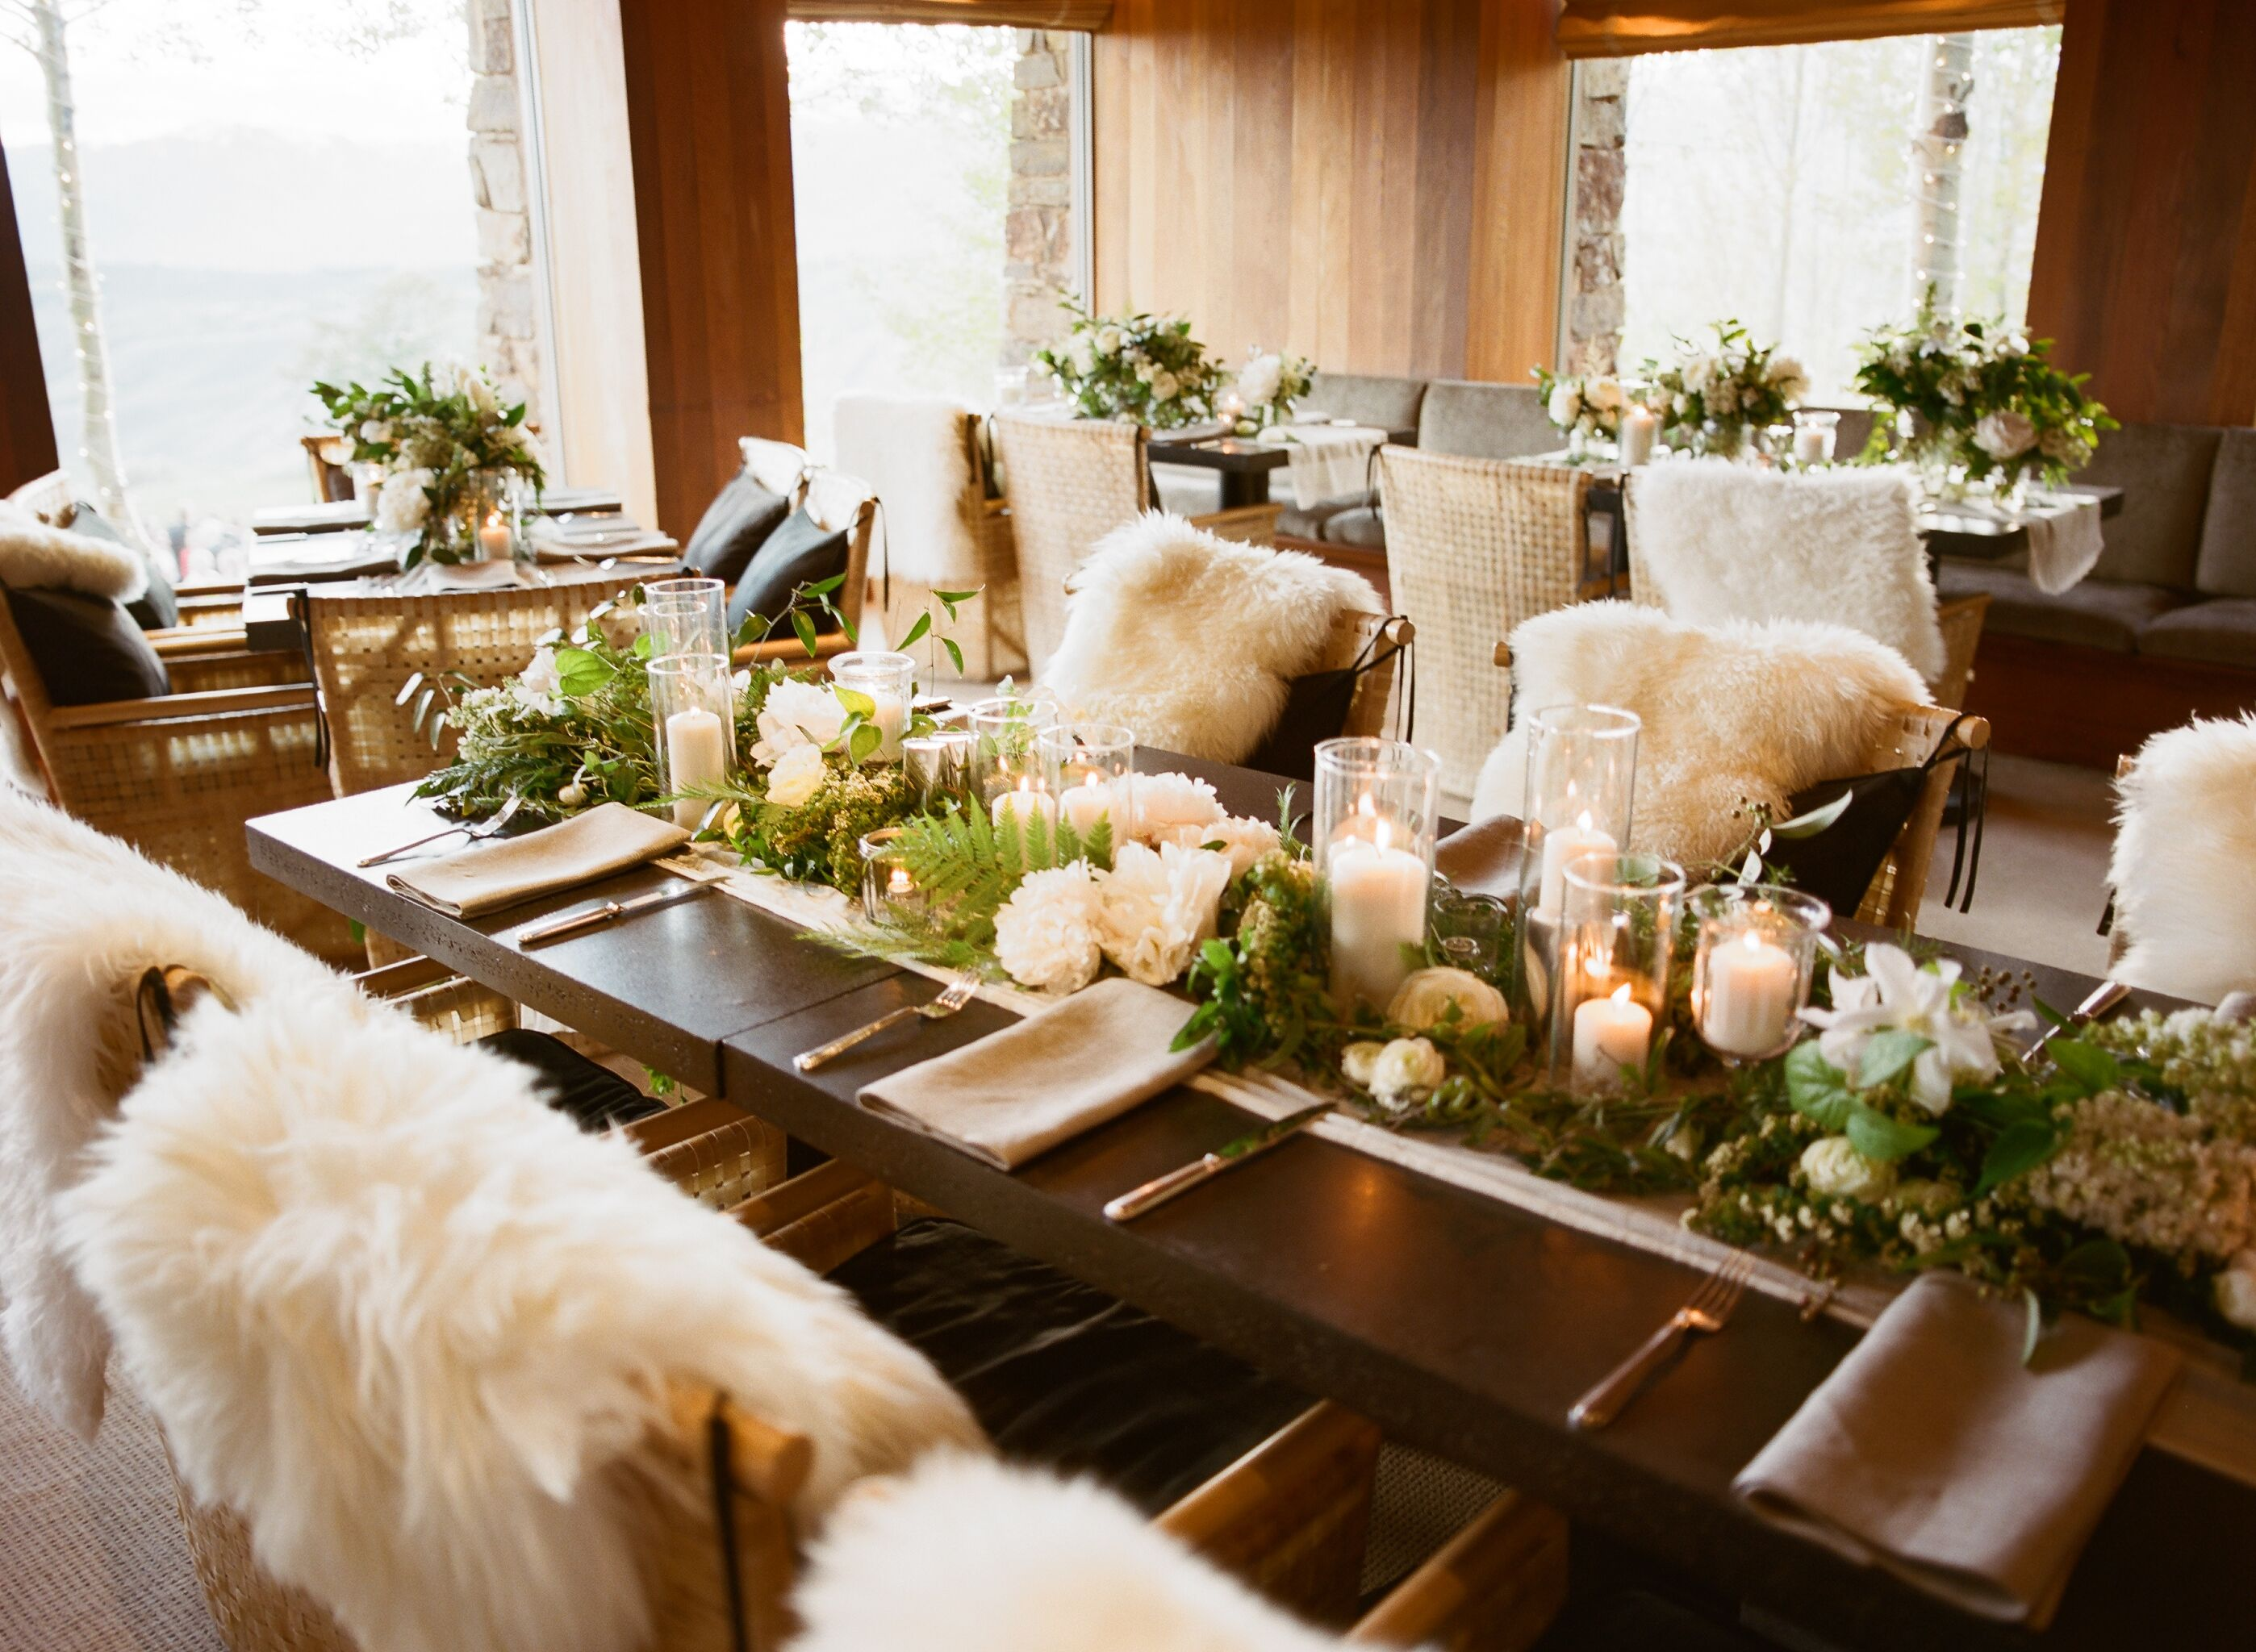 Rustic Faux Sheepskin Reception Decor Winter Dining Table Decor Christmas Dining Table Dining Table Centerpiece